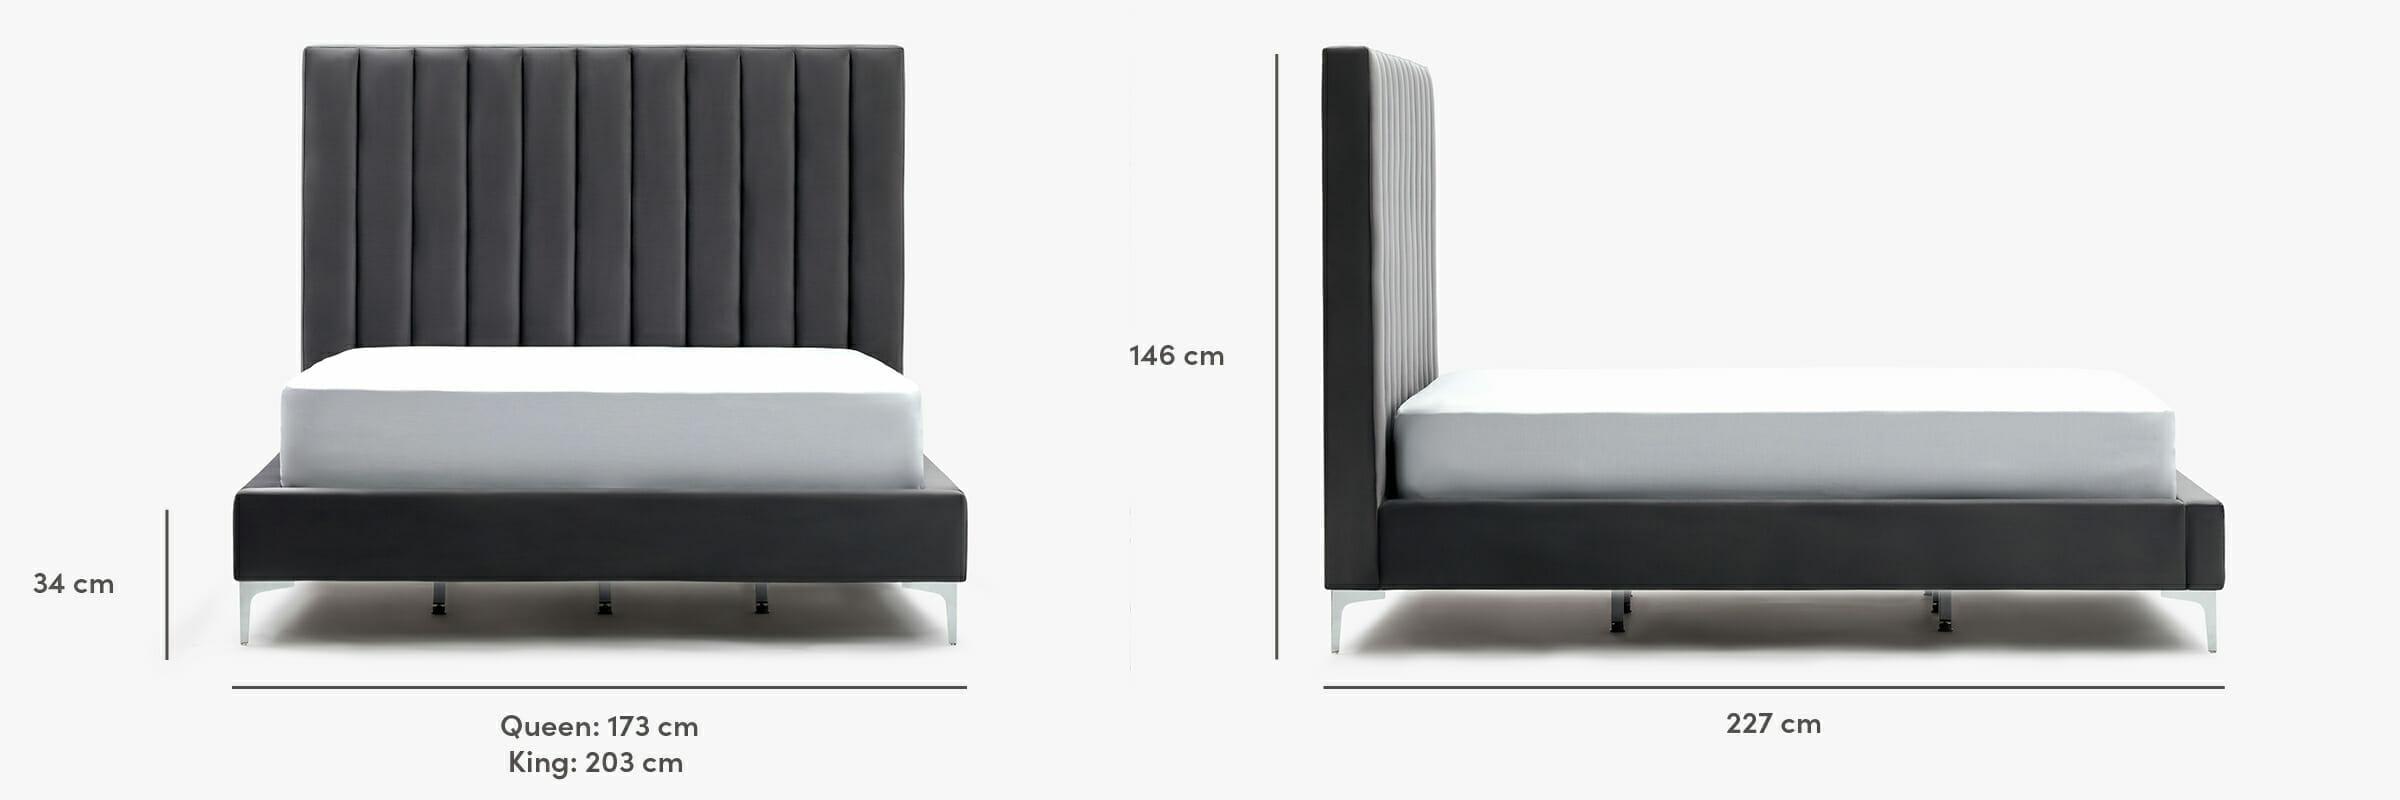 Parker bed dimensions